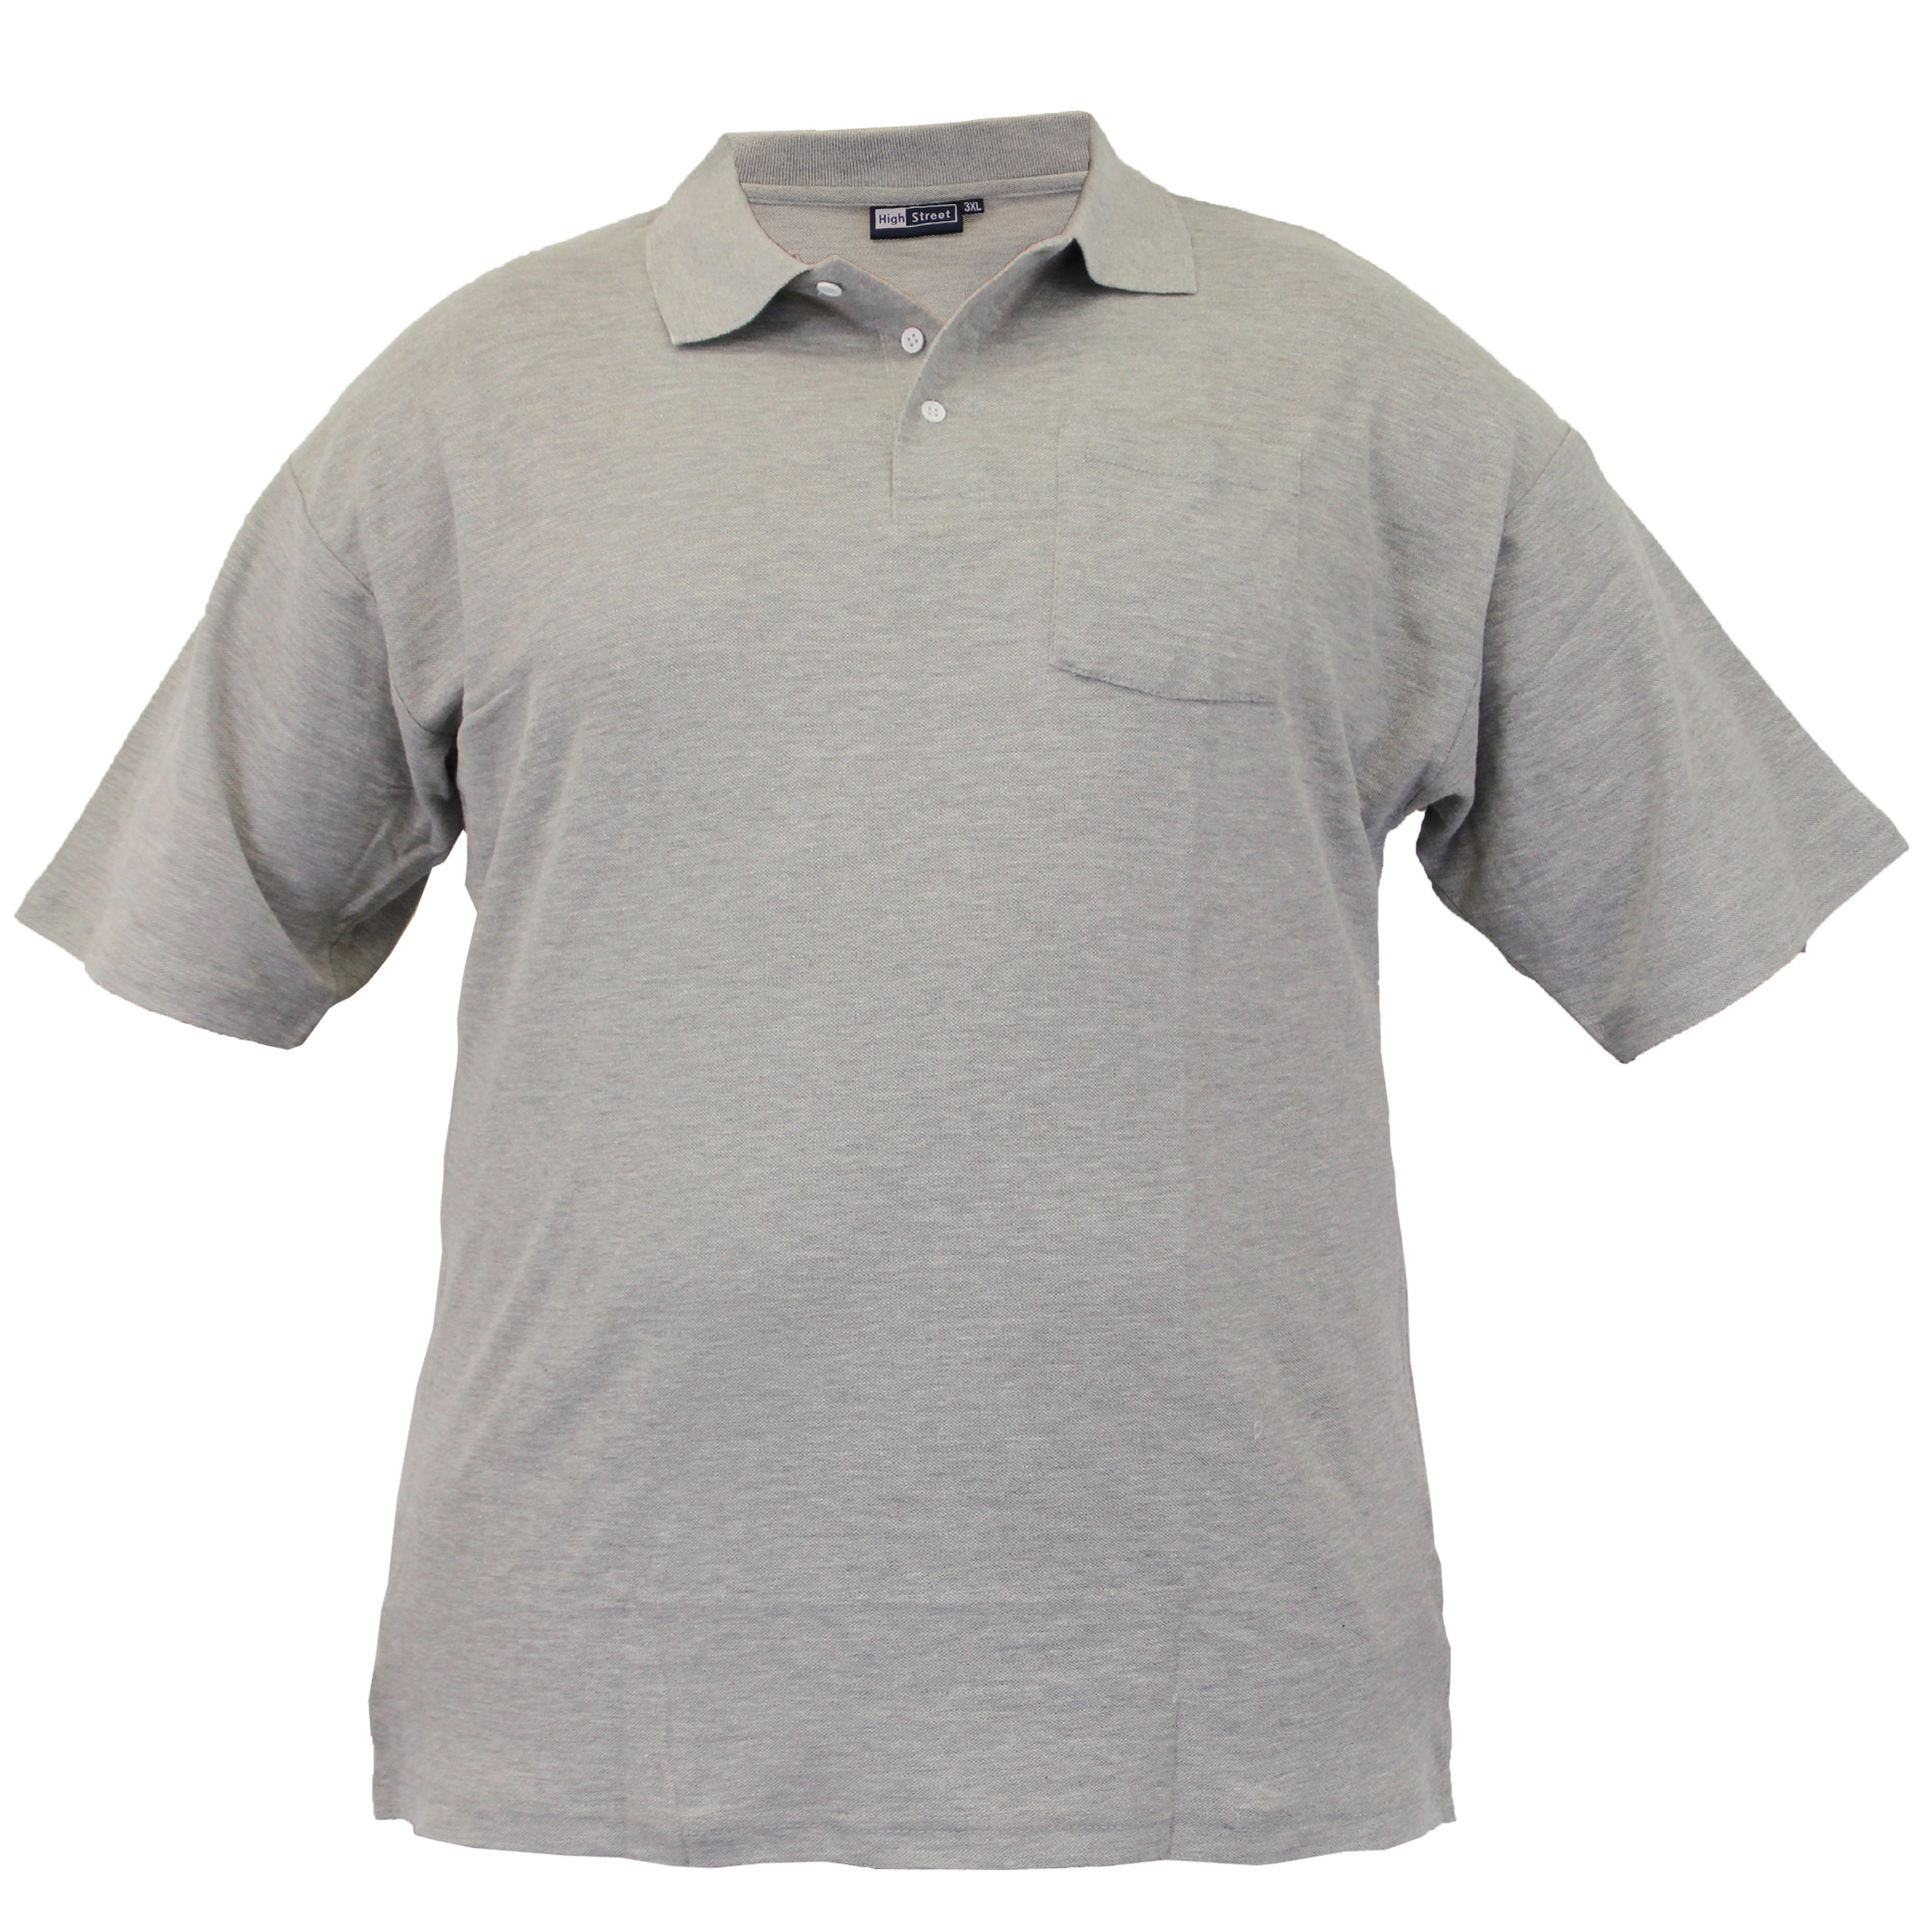 Mens Short Sleeved Pique Polo Shirts Big King Size Ebay